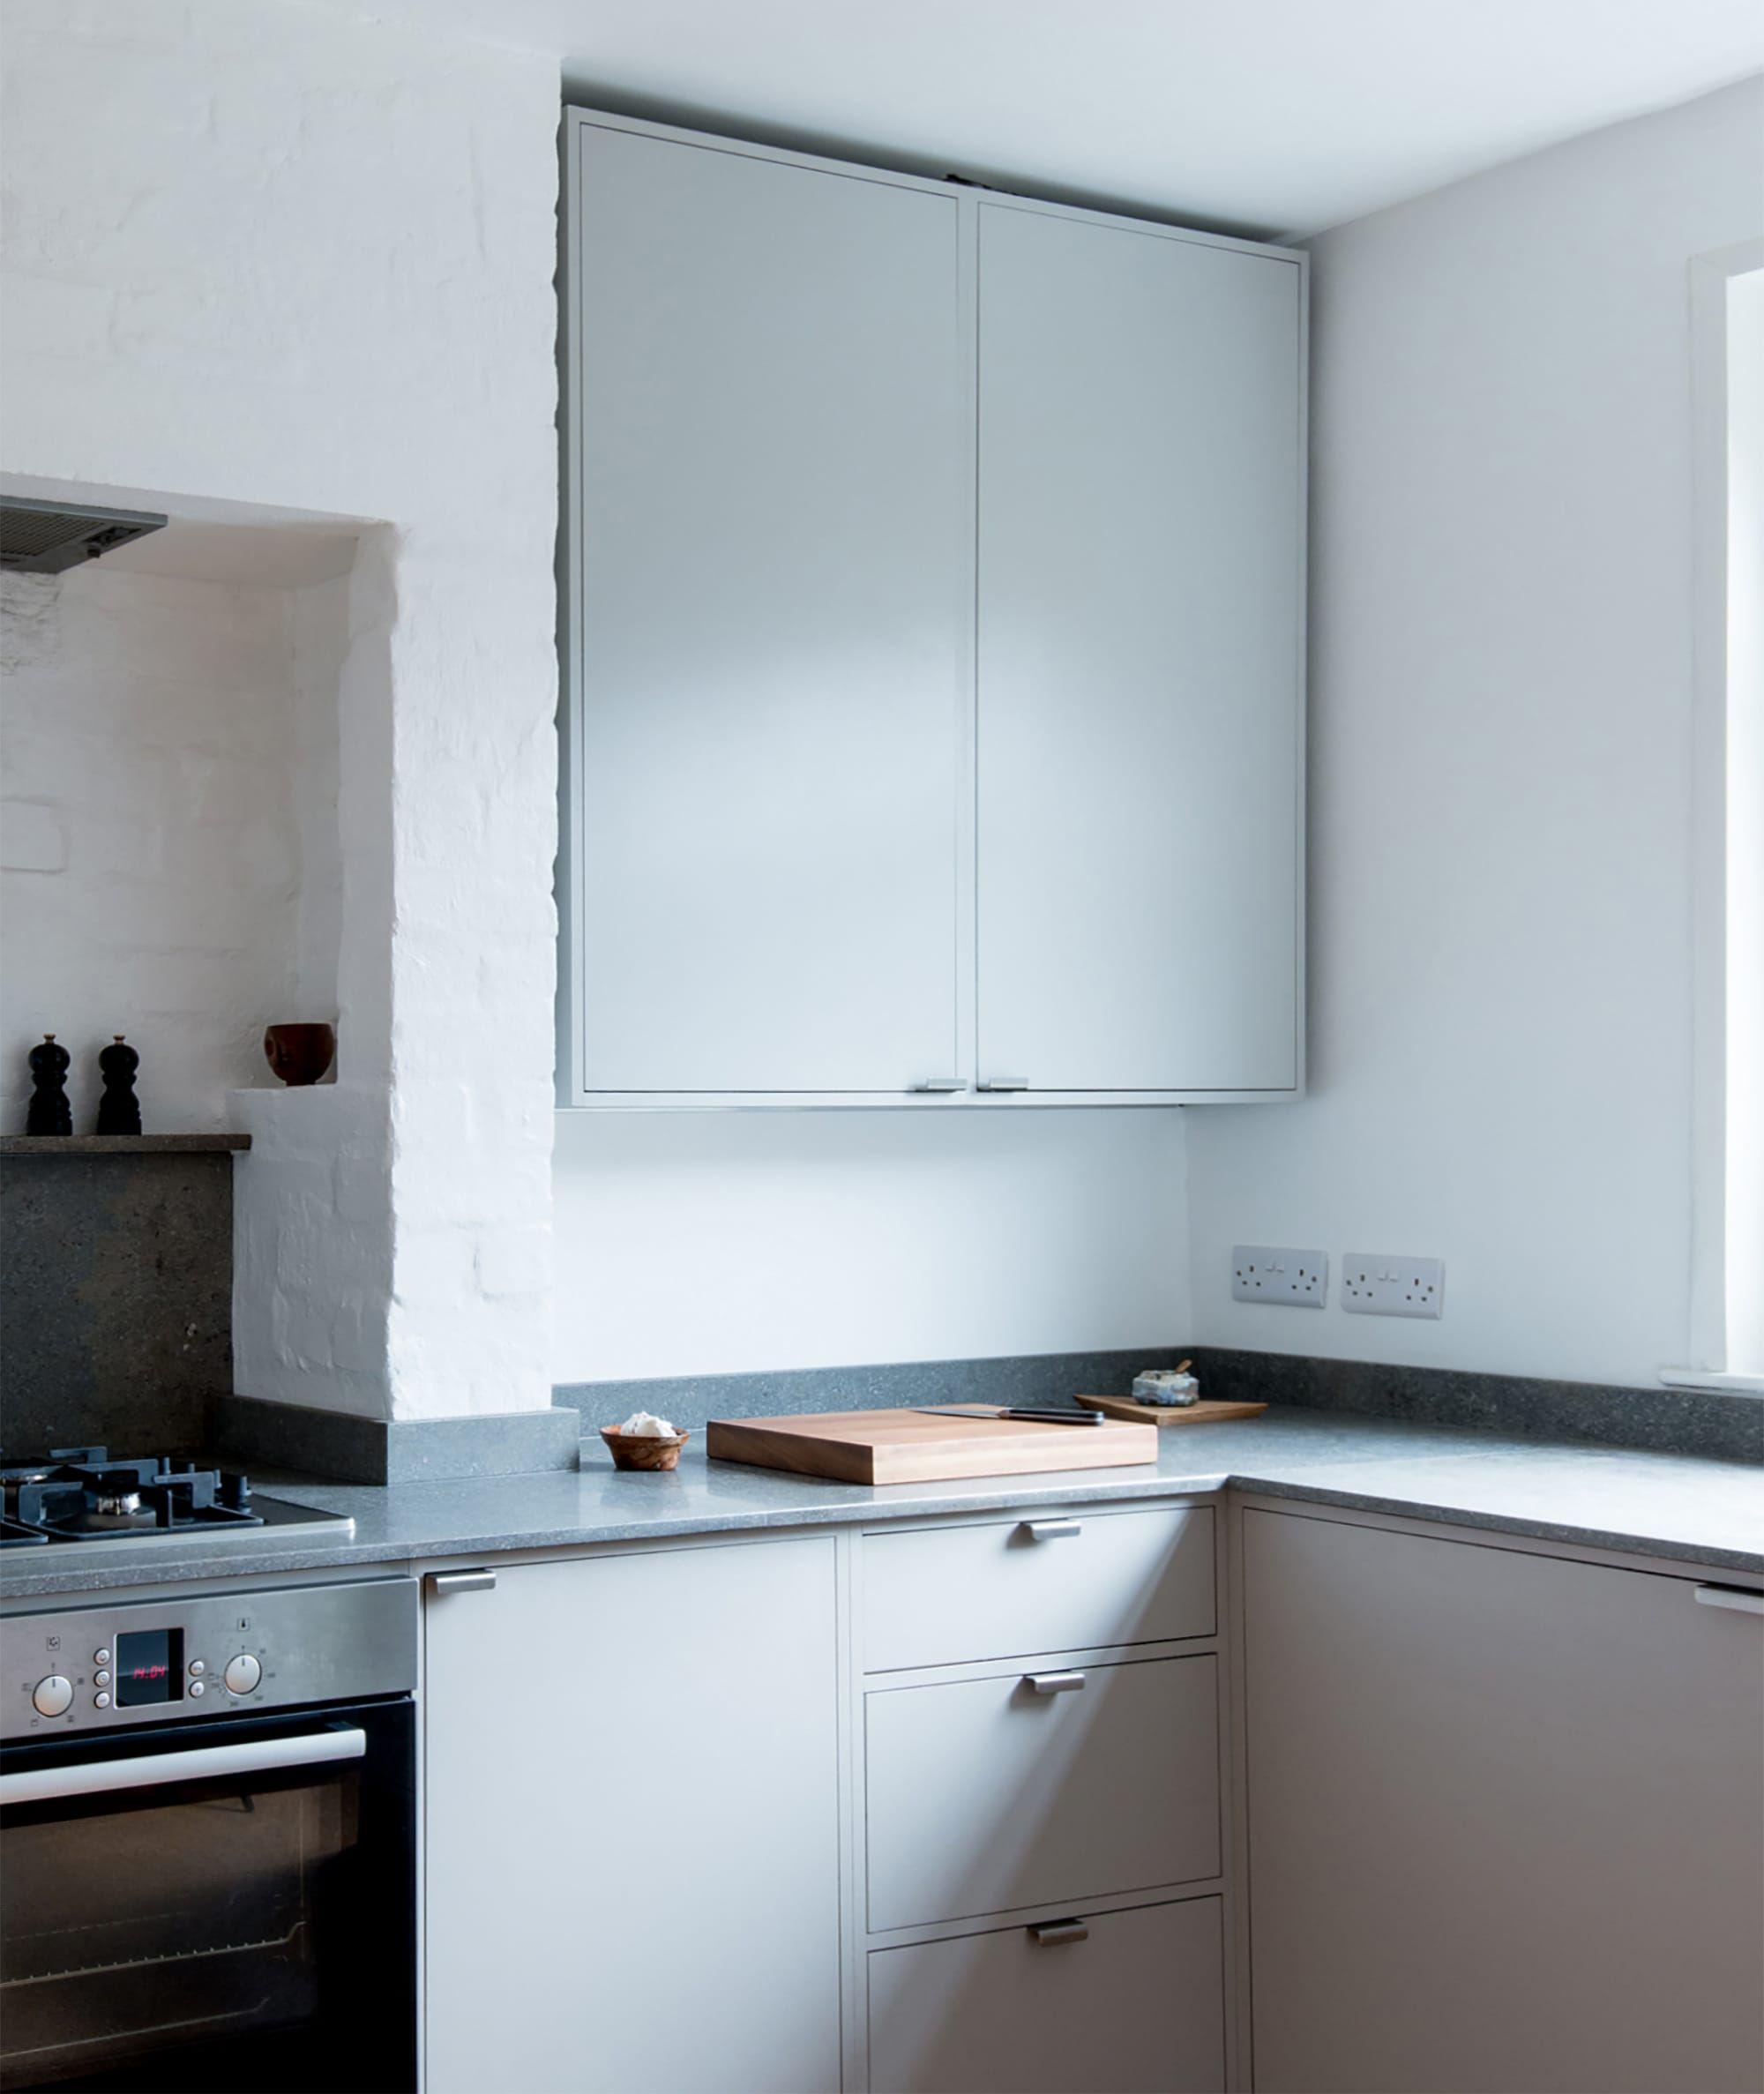 Tall grey kitchen wall units with dark grey limestone worktop.